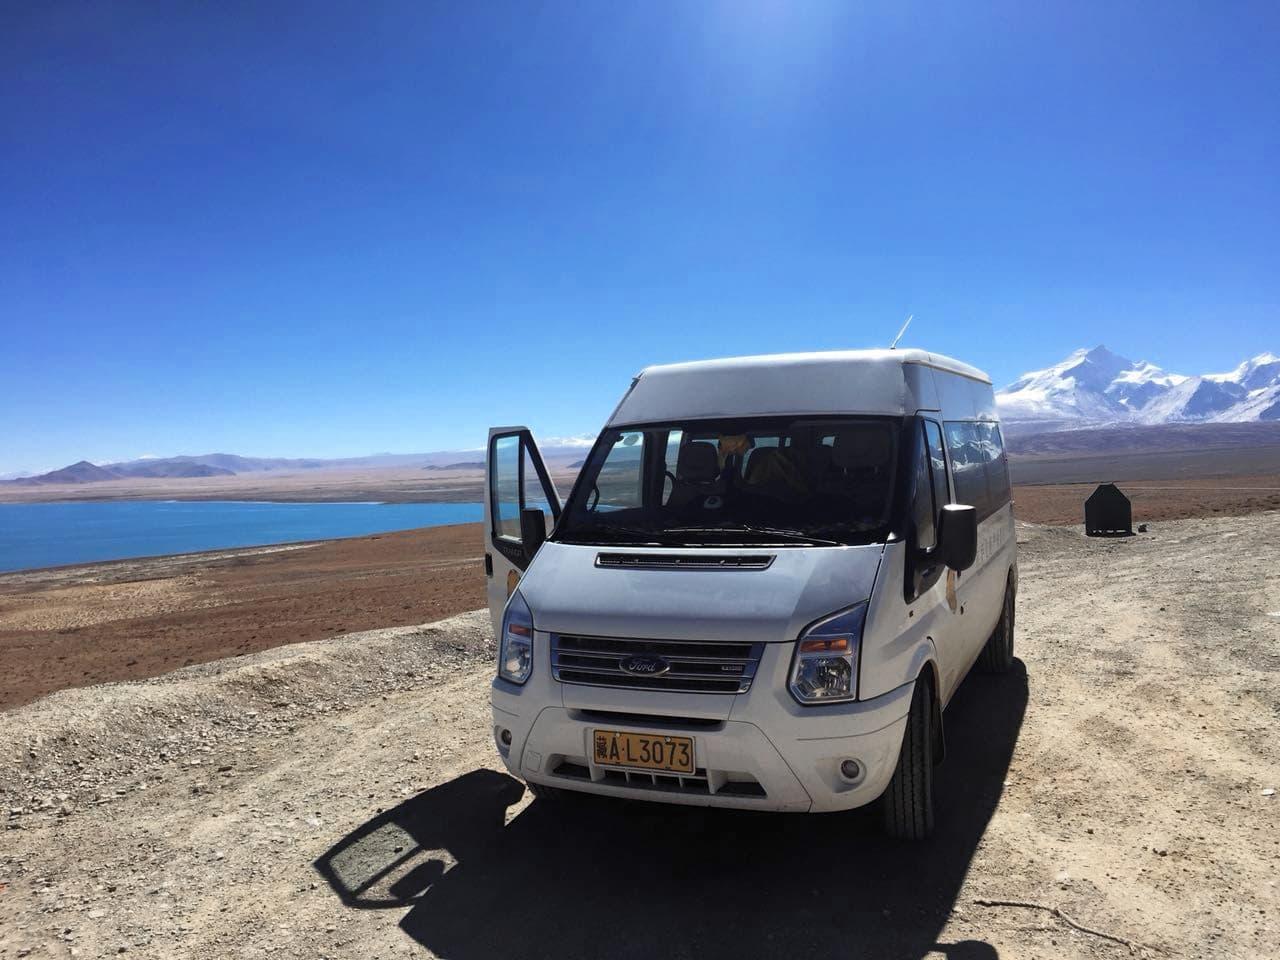 Minivan by the Yamdrok Lake in Tibet